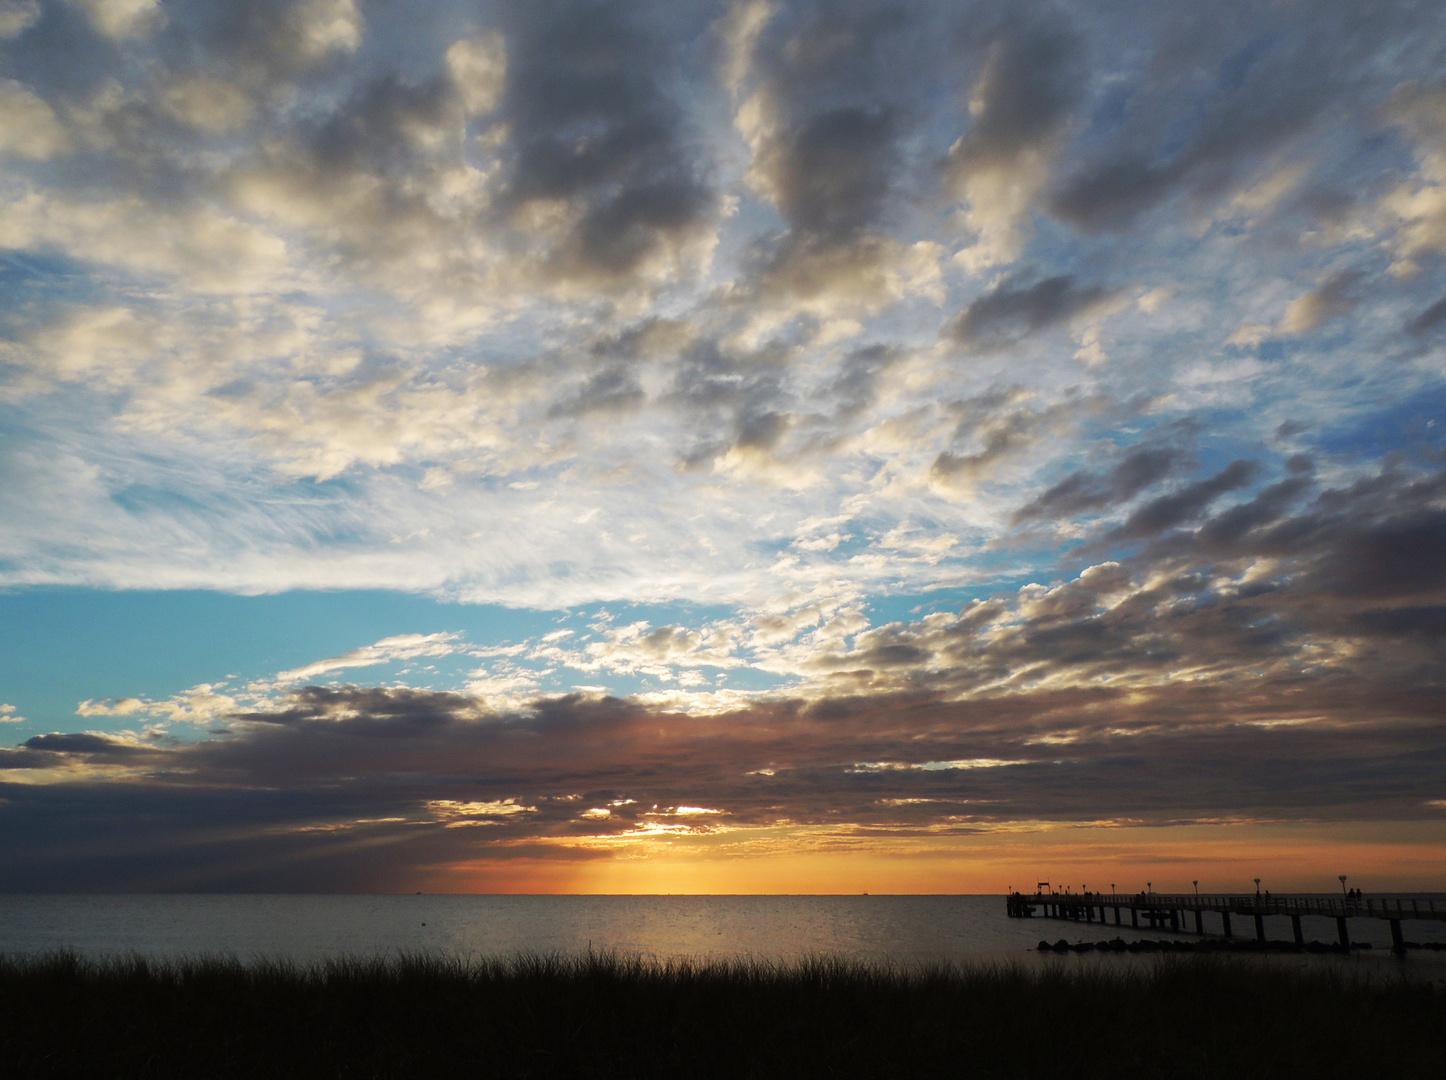 Wolkig-bunter Sonnenuntergang